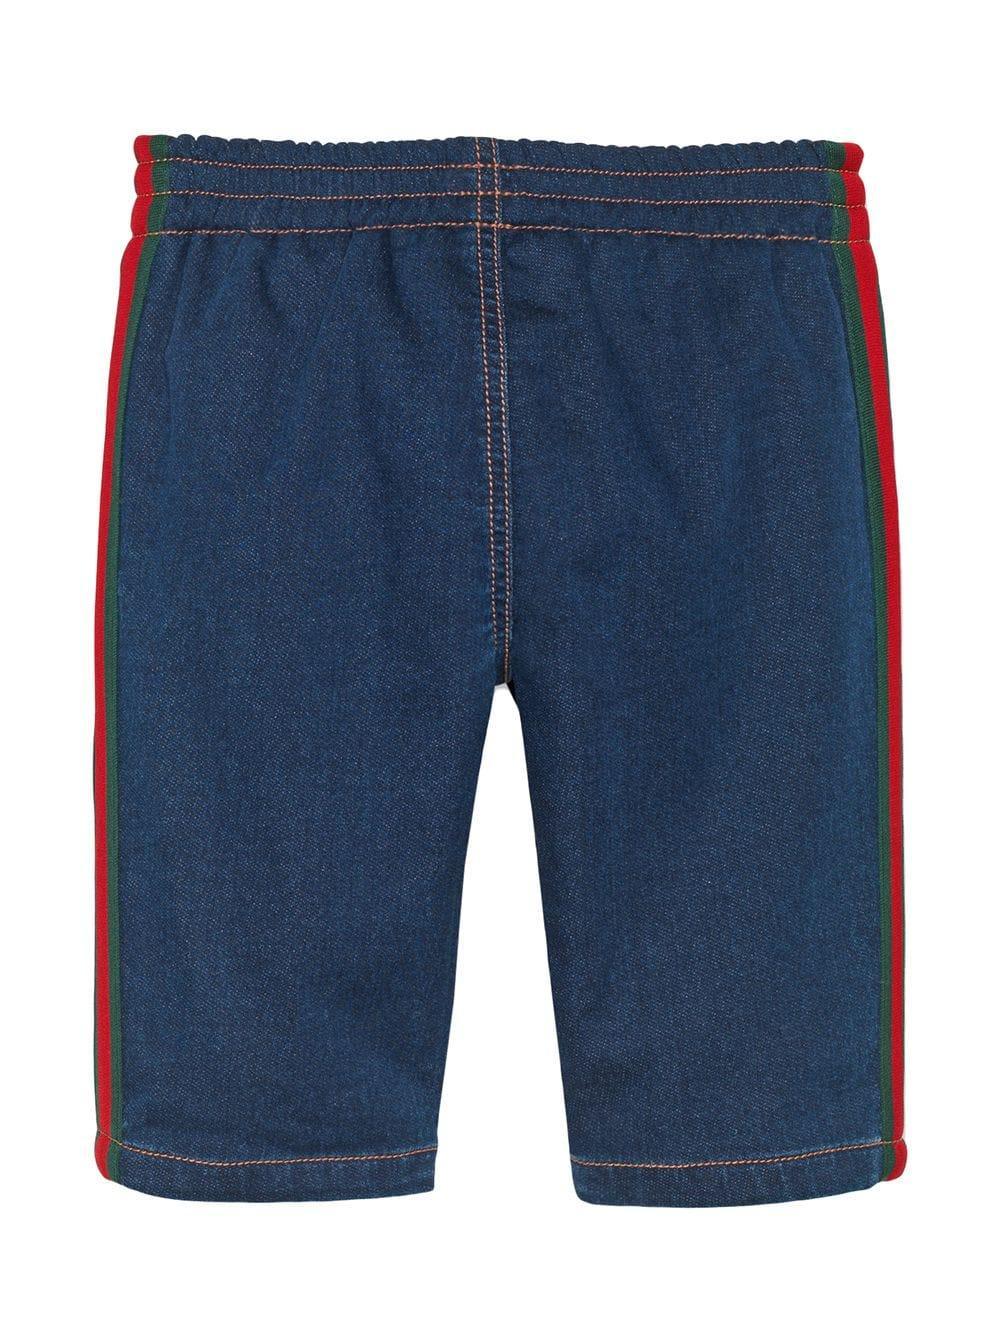 dc3967bae Kids shorts vaqueros con detalle web ... 190